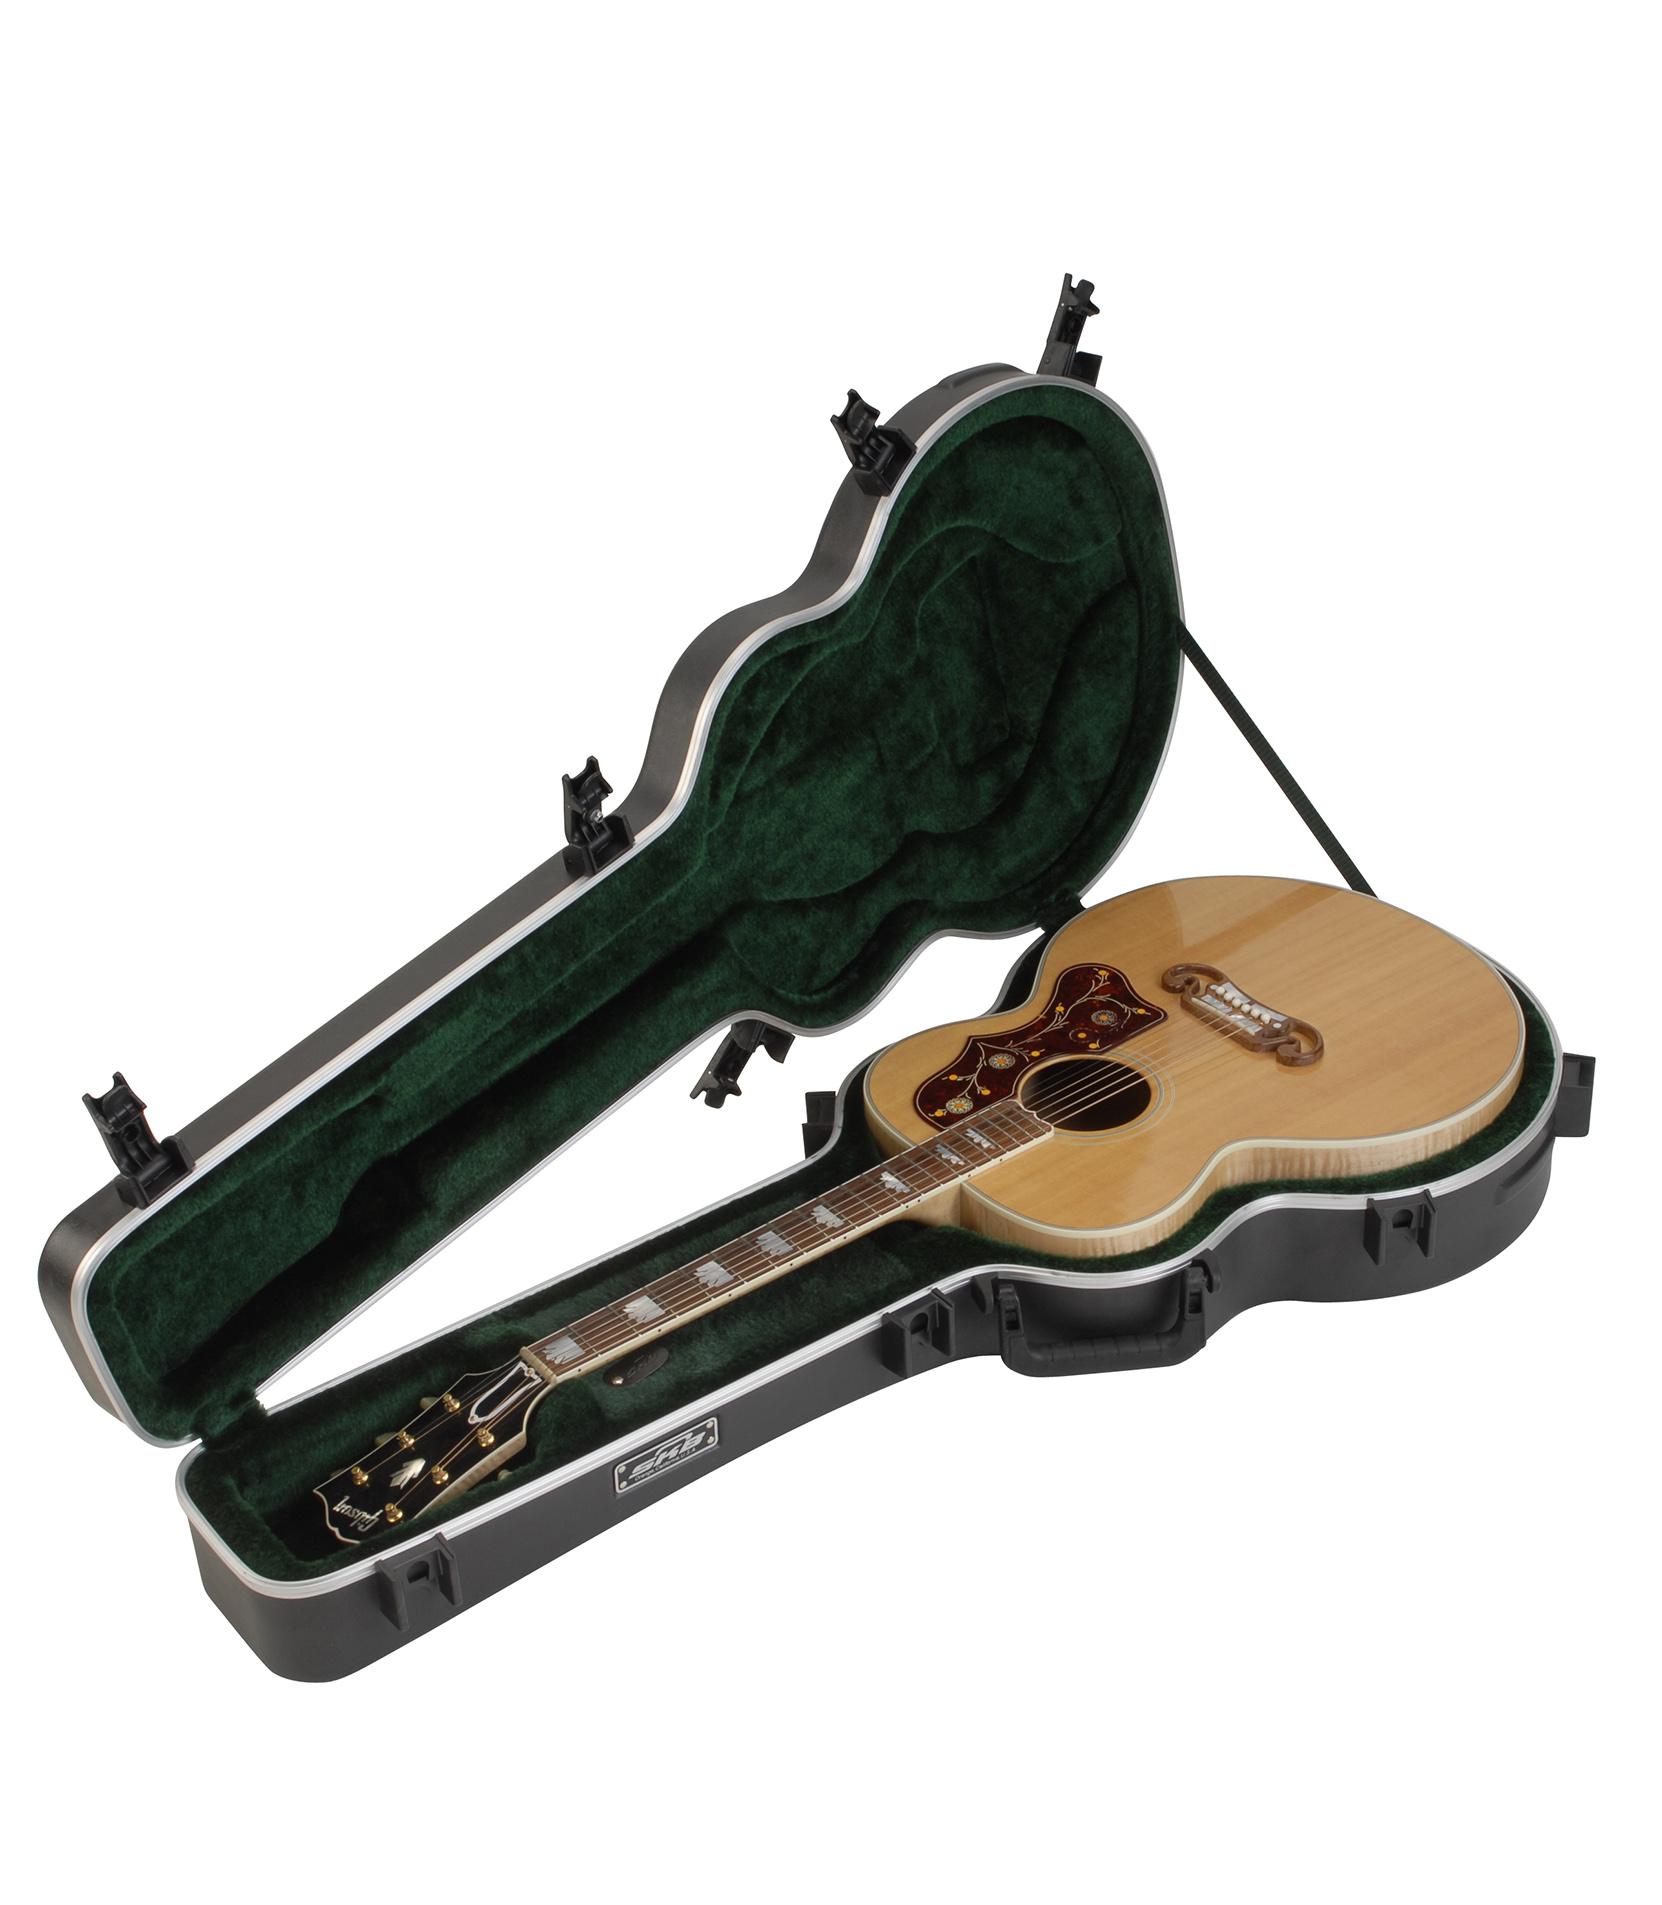 Melody House Musical Instruments Store - 1SKB 20 Universal Jumbo Acoustic HardshellTSA L